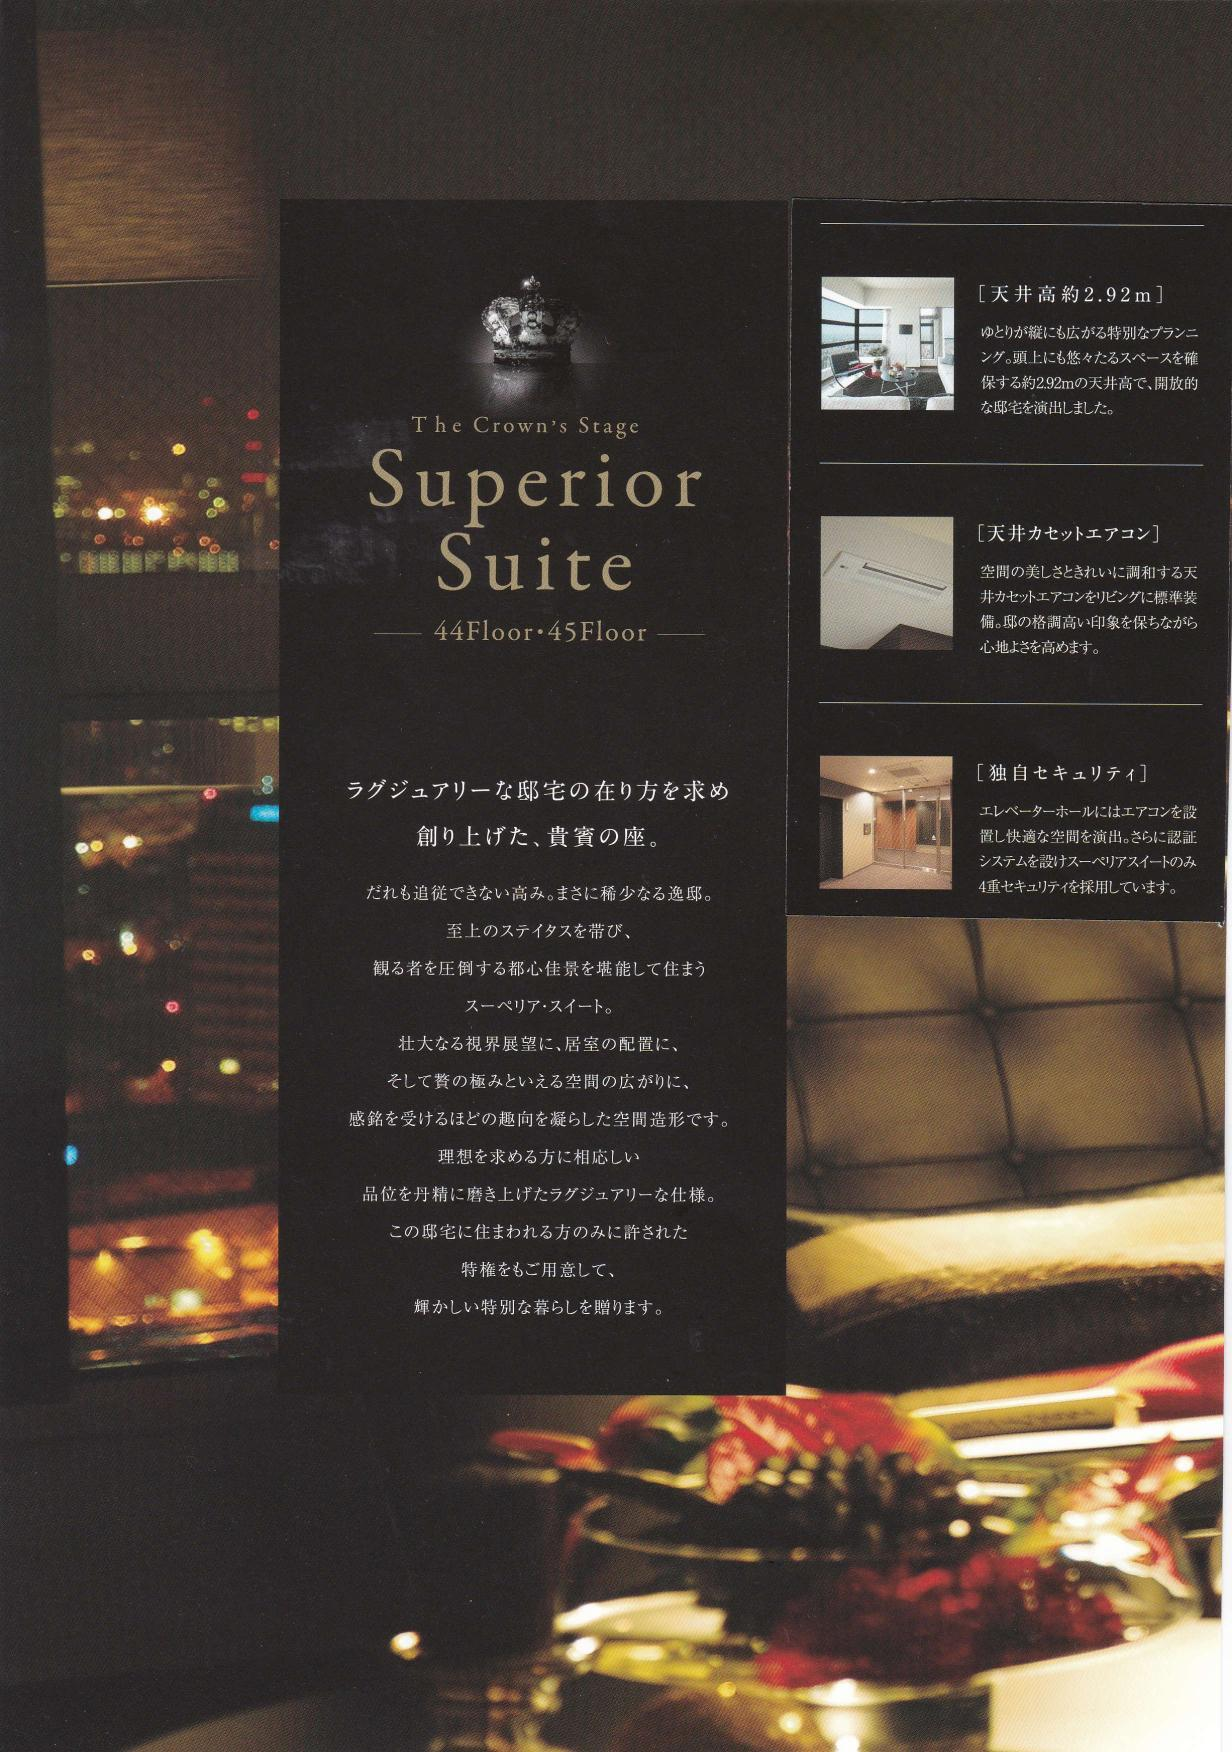 OSAKA福島タワー44階スーペリアスイート109.17㎡販売開始!_b0121630_13105238.jpg